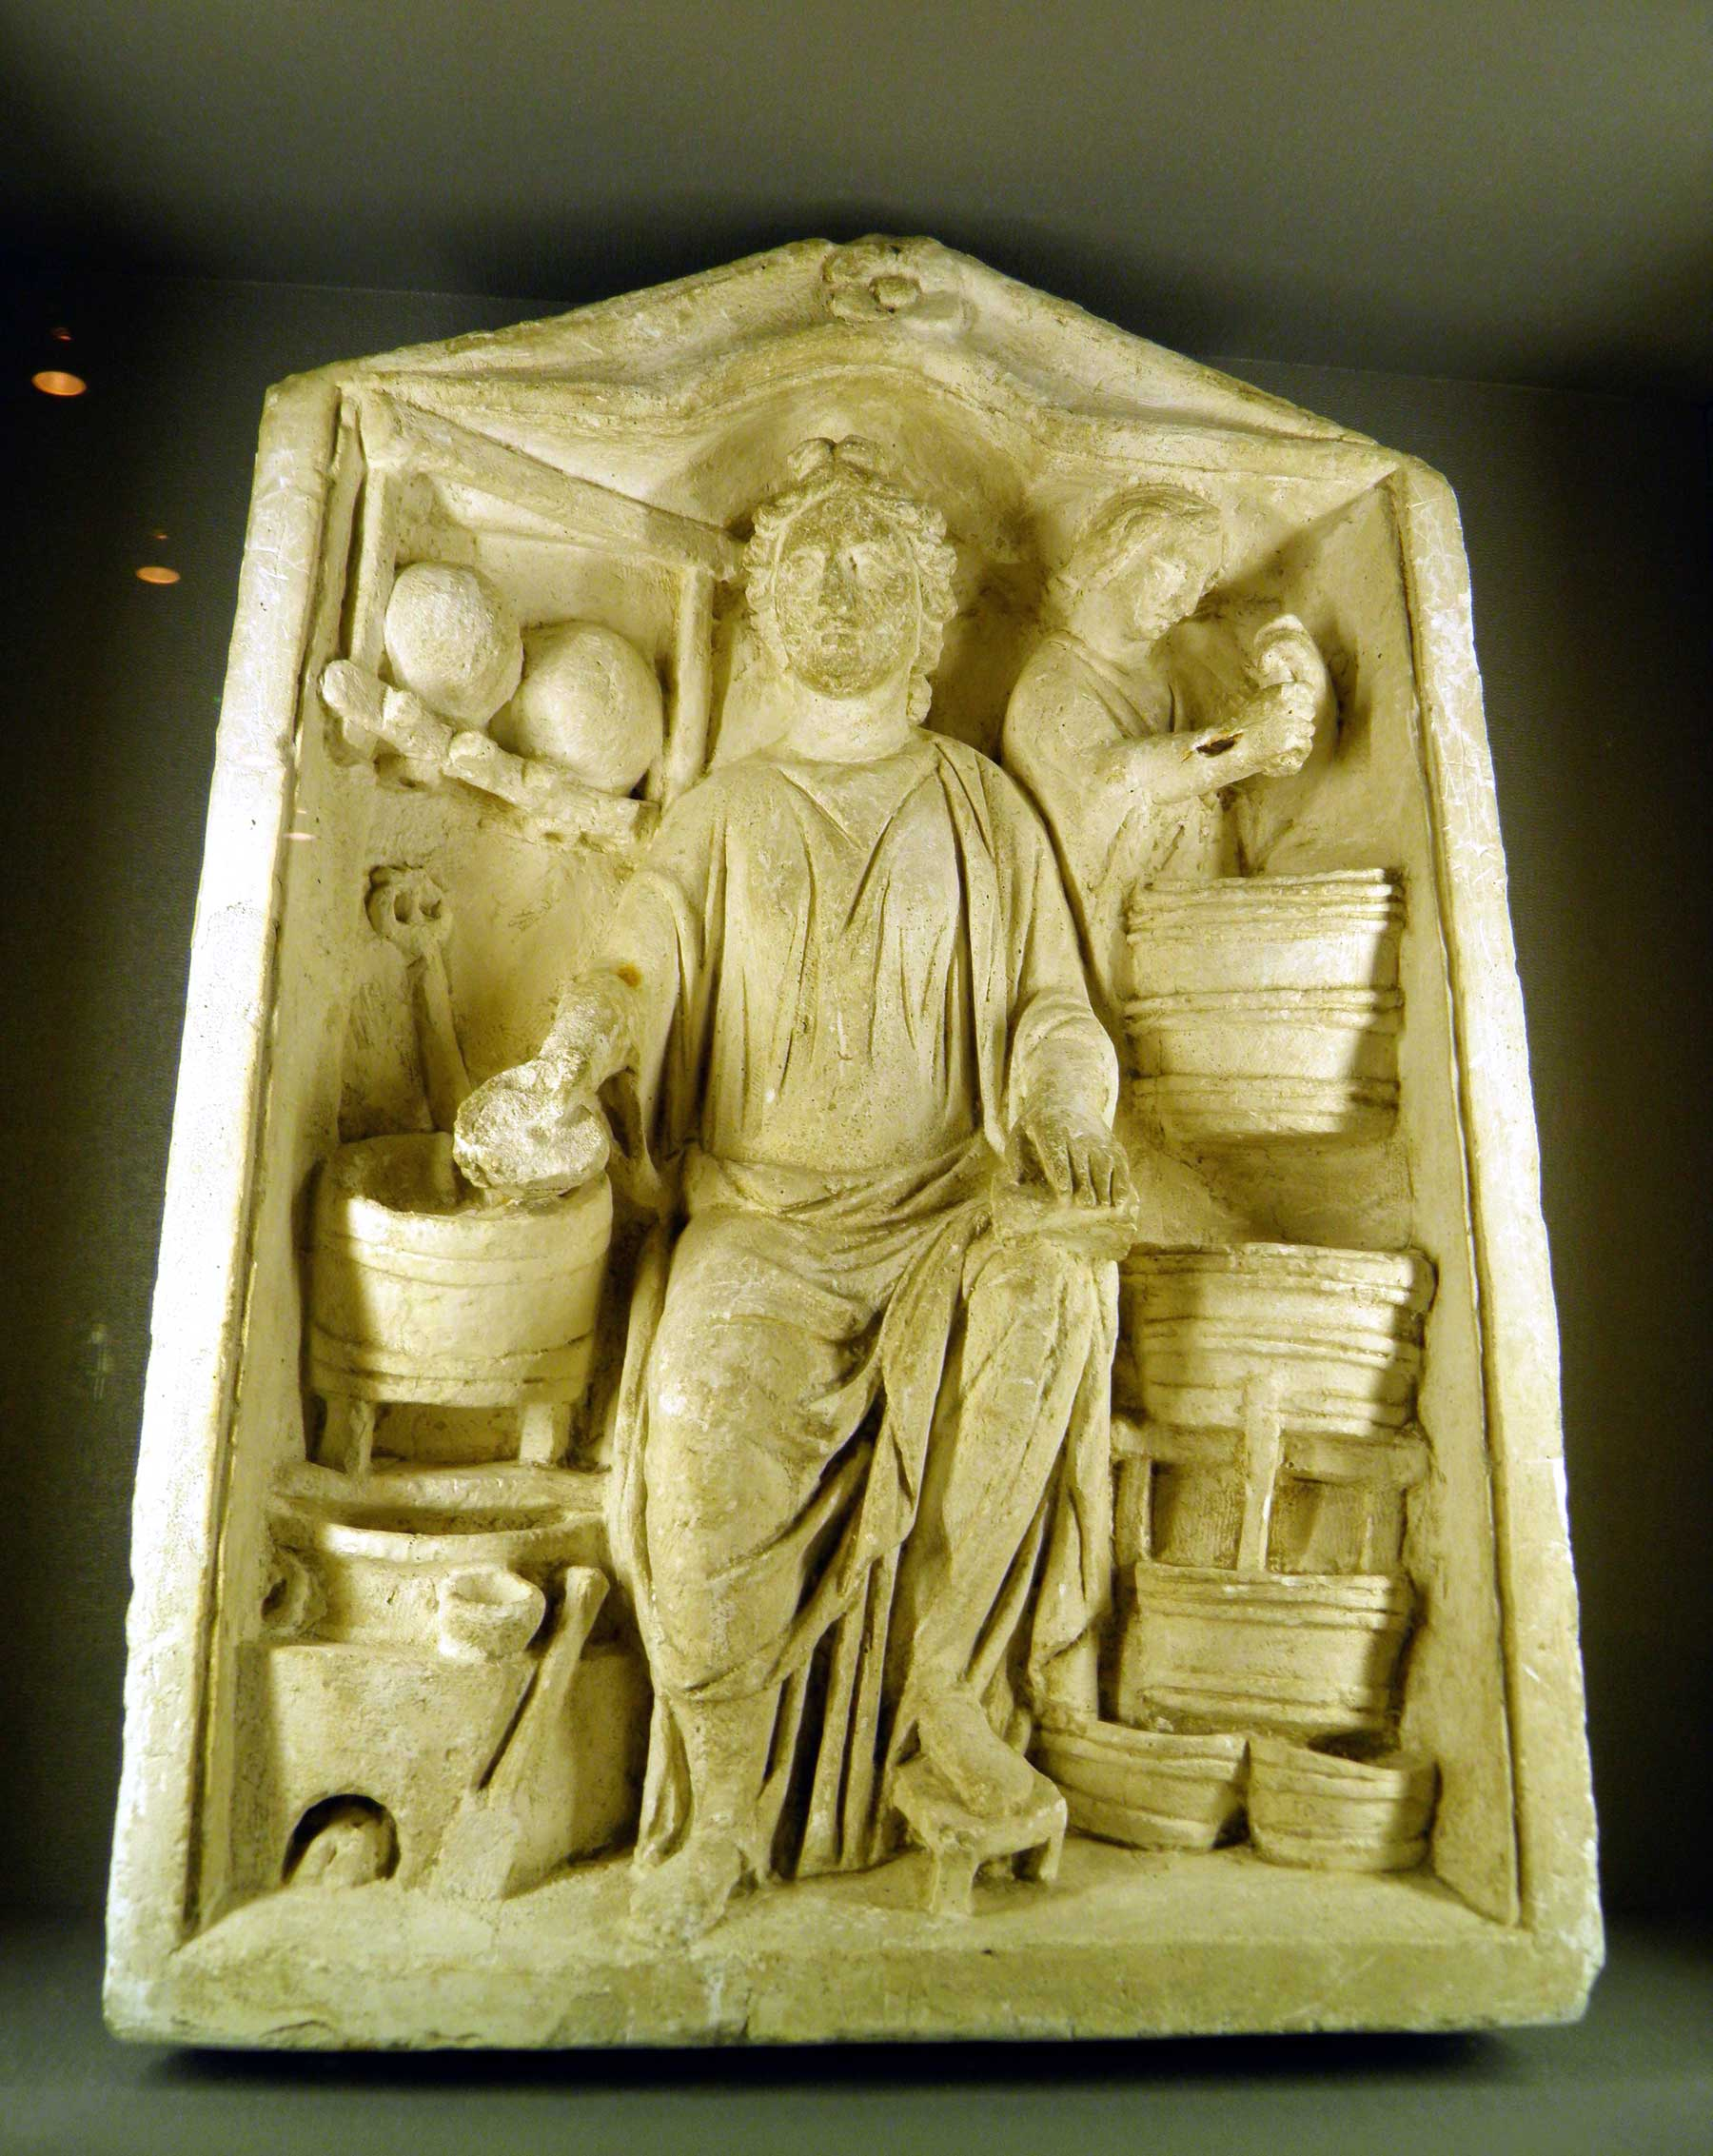 Relief of Meditrina in Grand, France